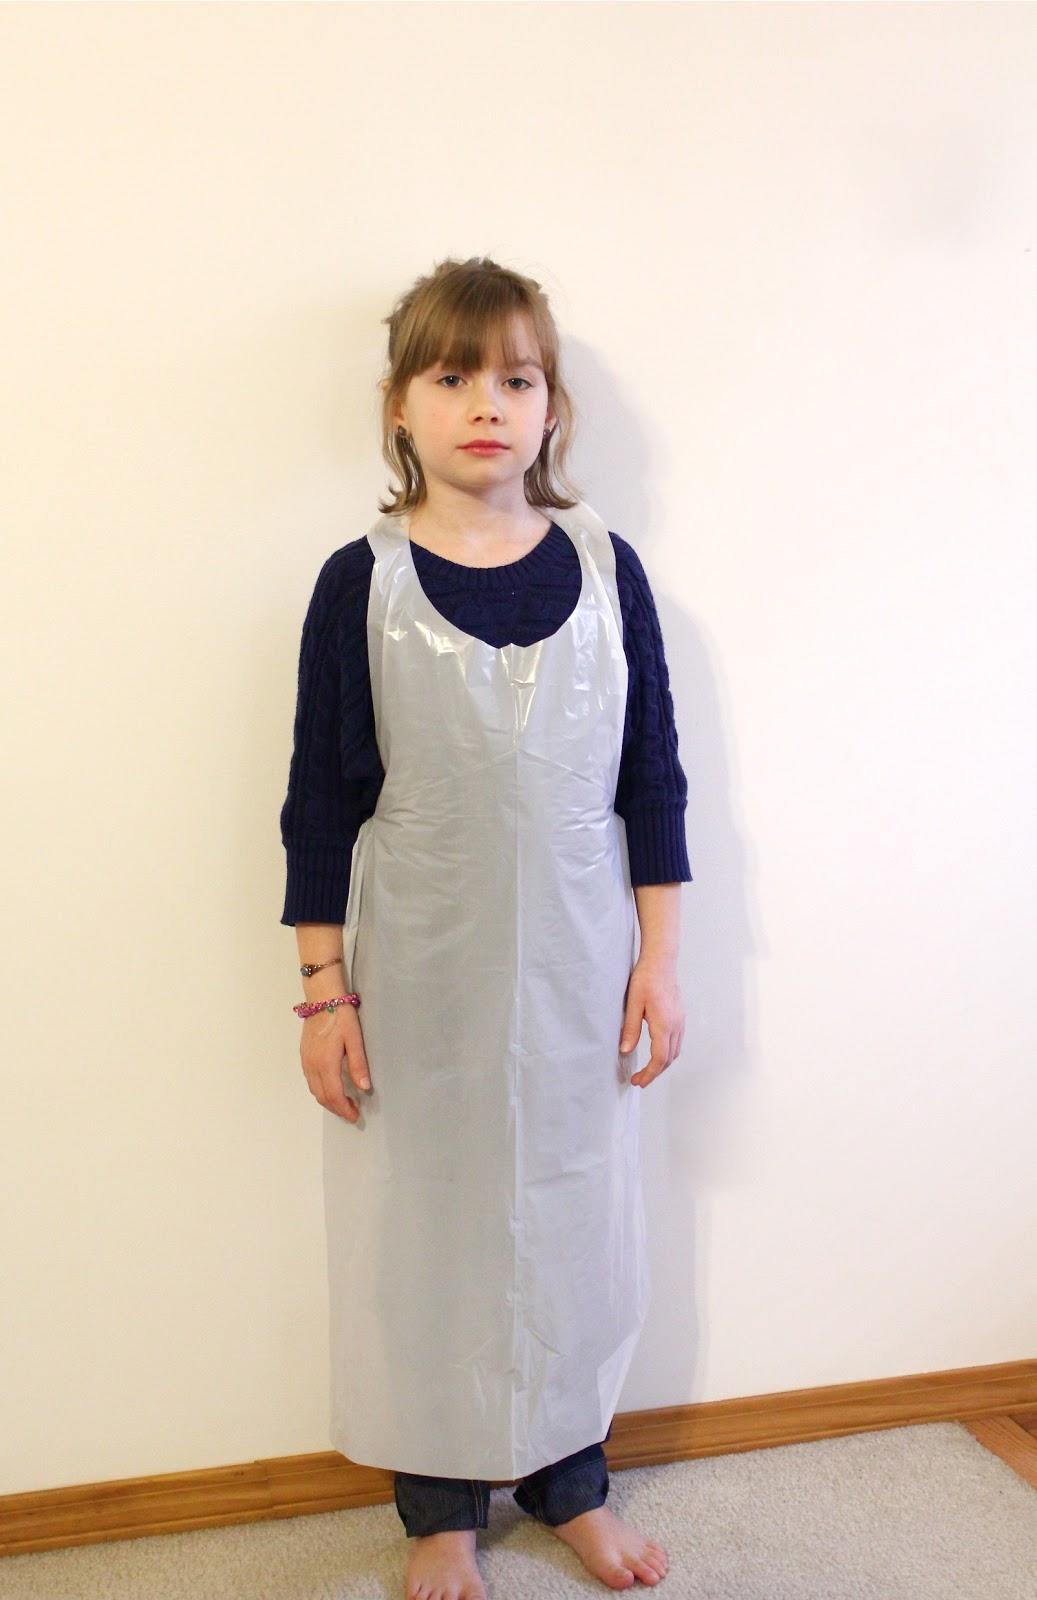 Champaign Plastics / Disposable Plastic Wear: Children's ...